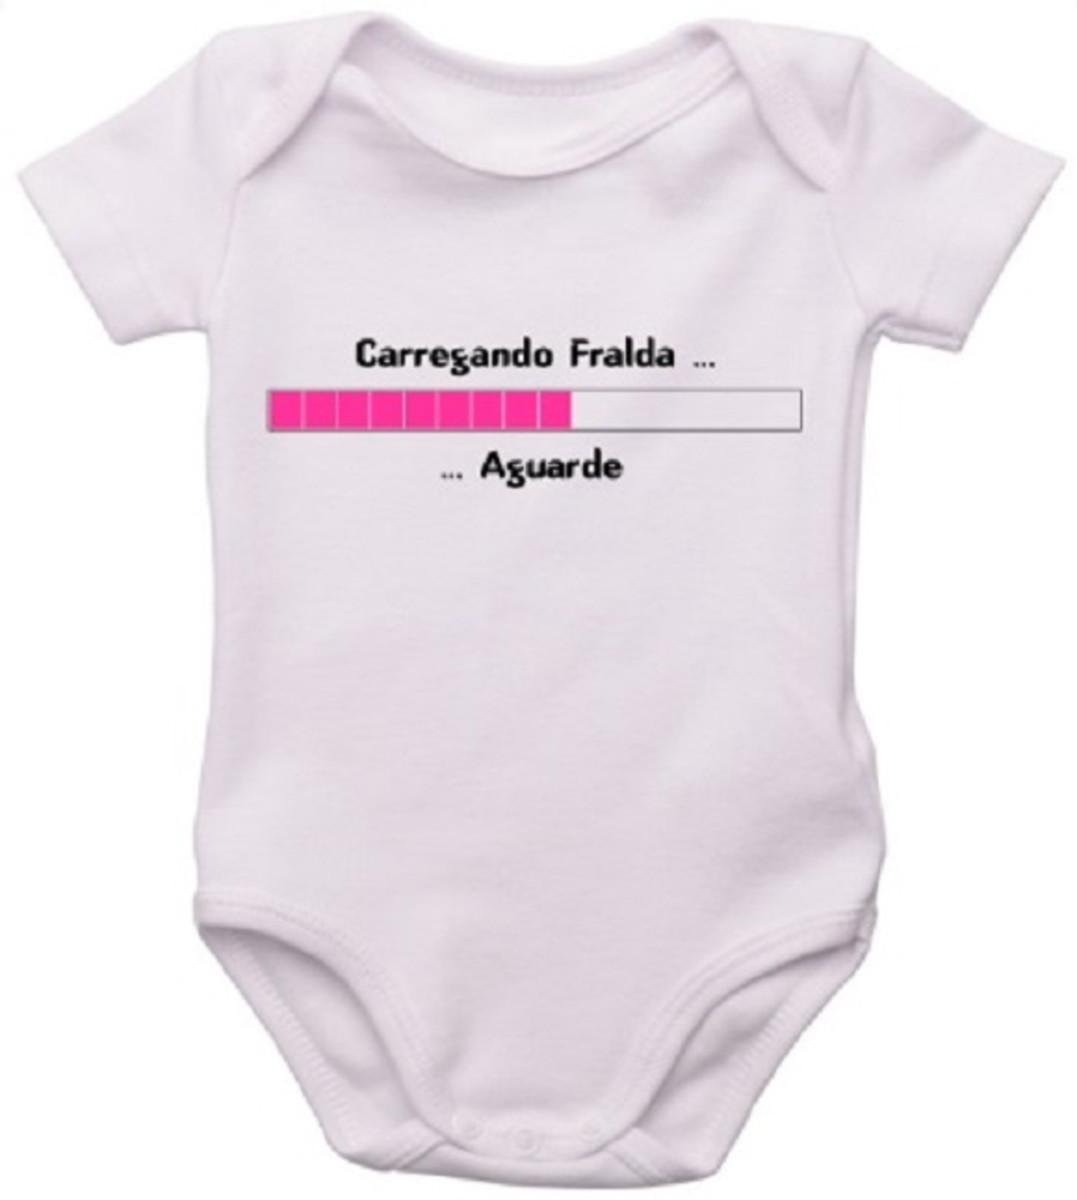 cbe72a970 Body Bori Borie Infantil Bebe Personalizado Carregando frald no Elo7 ...